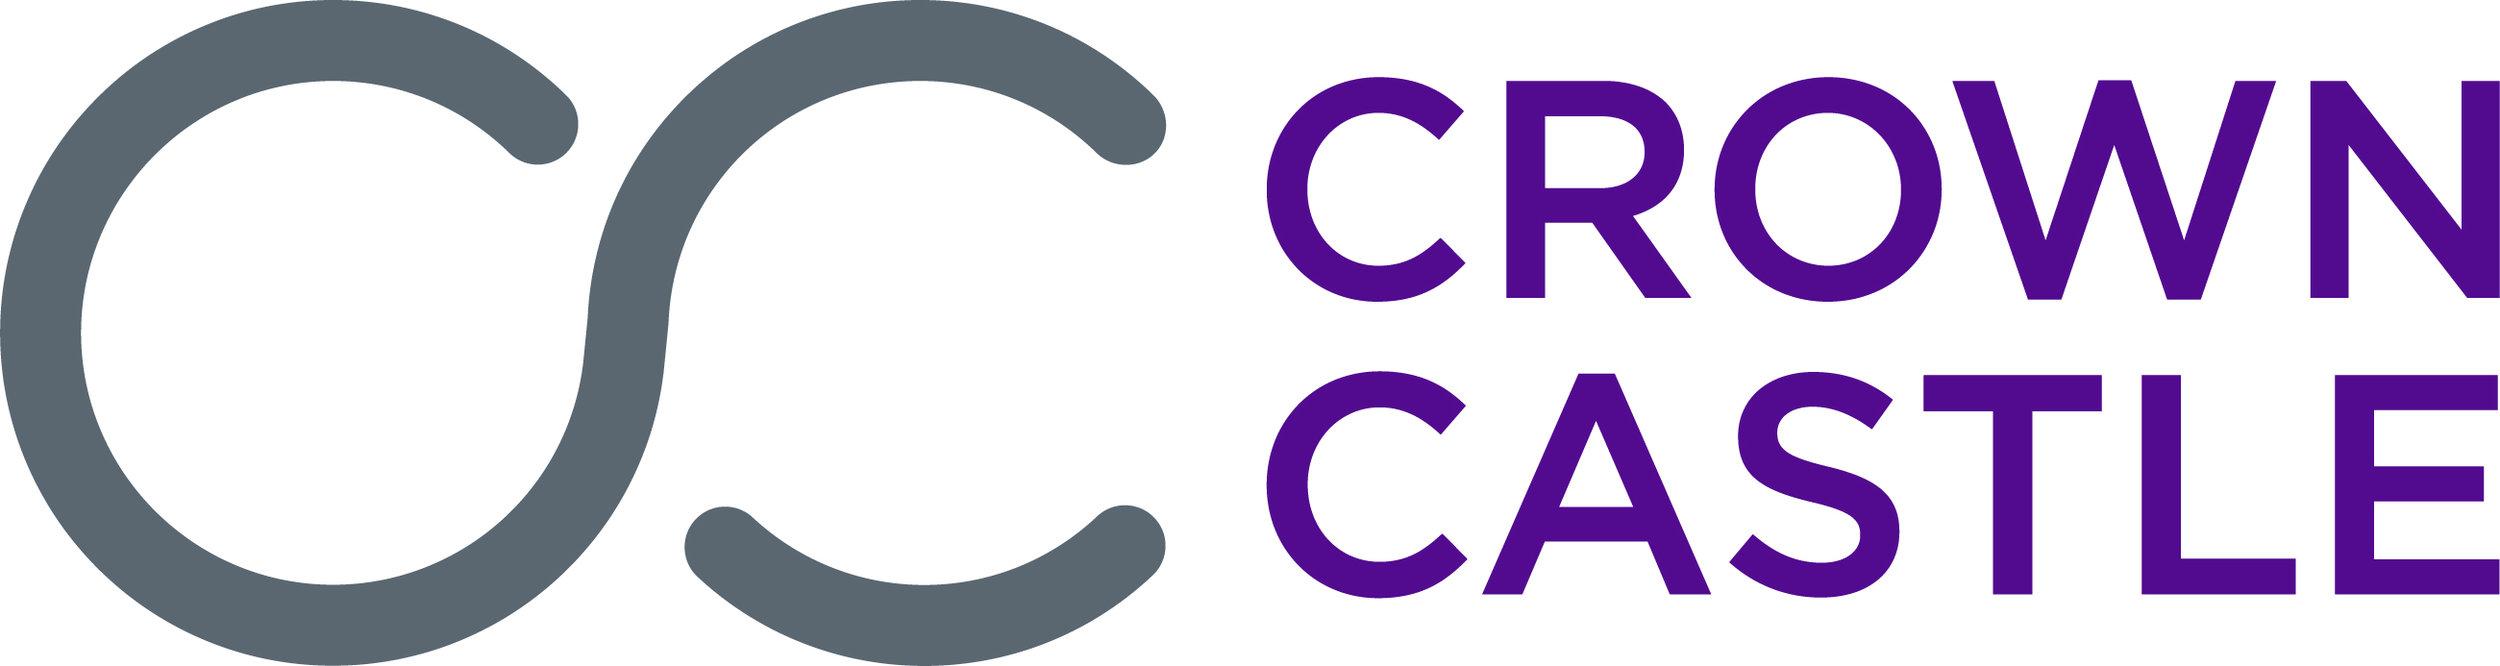 CCMasterbrand_Logo_RGB.jpg